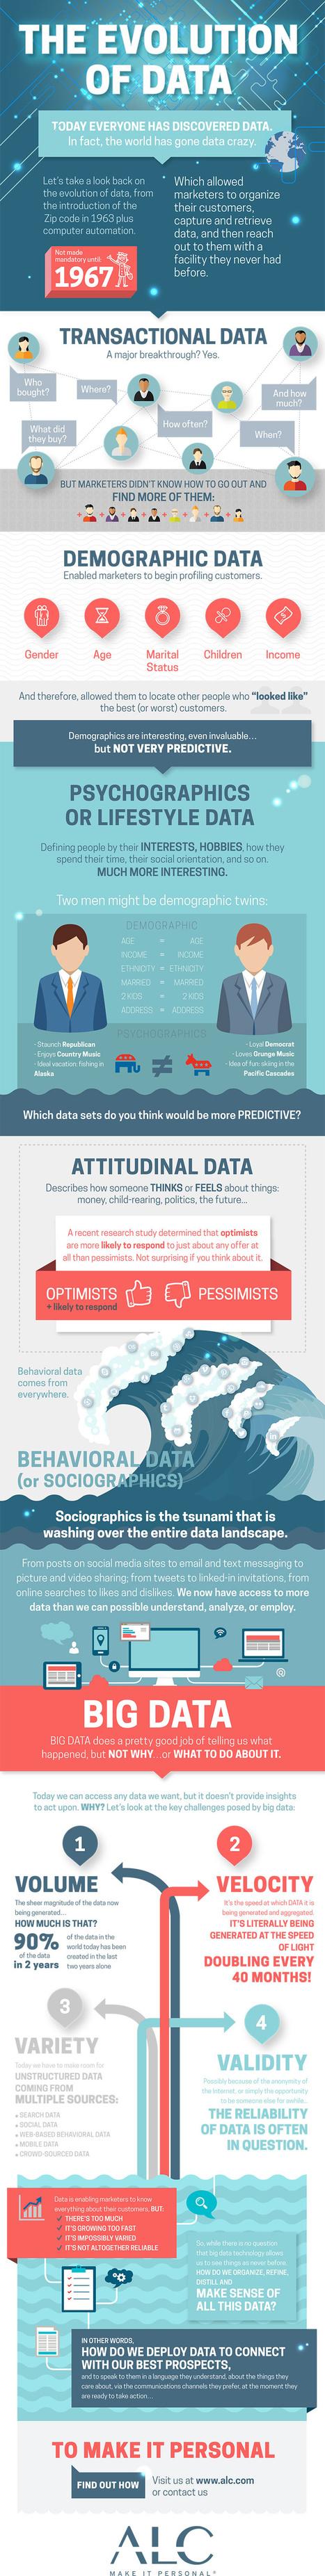 (Big) Data Evolution - Infographic | Big Data & Digital Marketing | Scoop.it